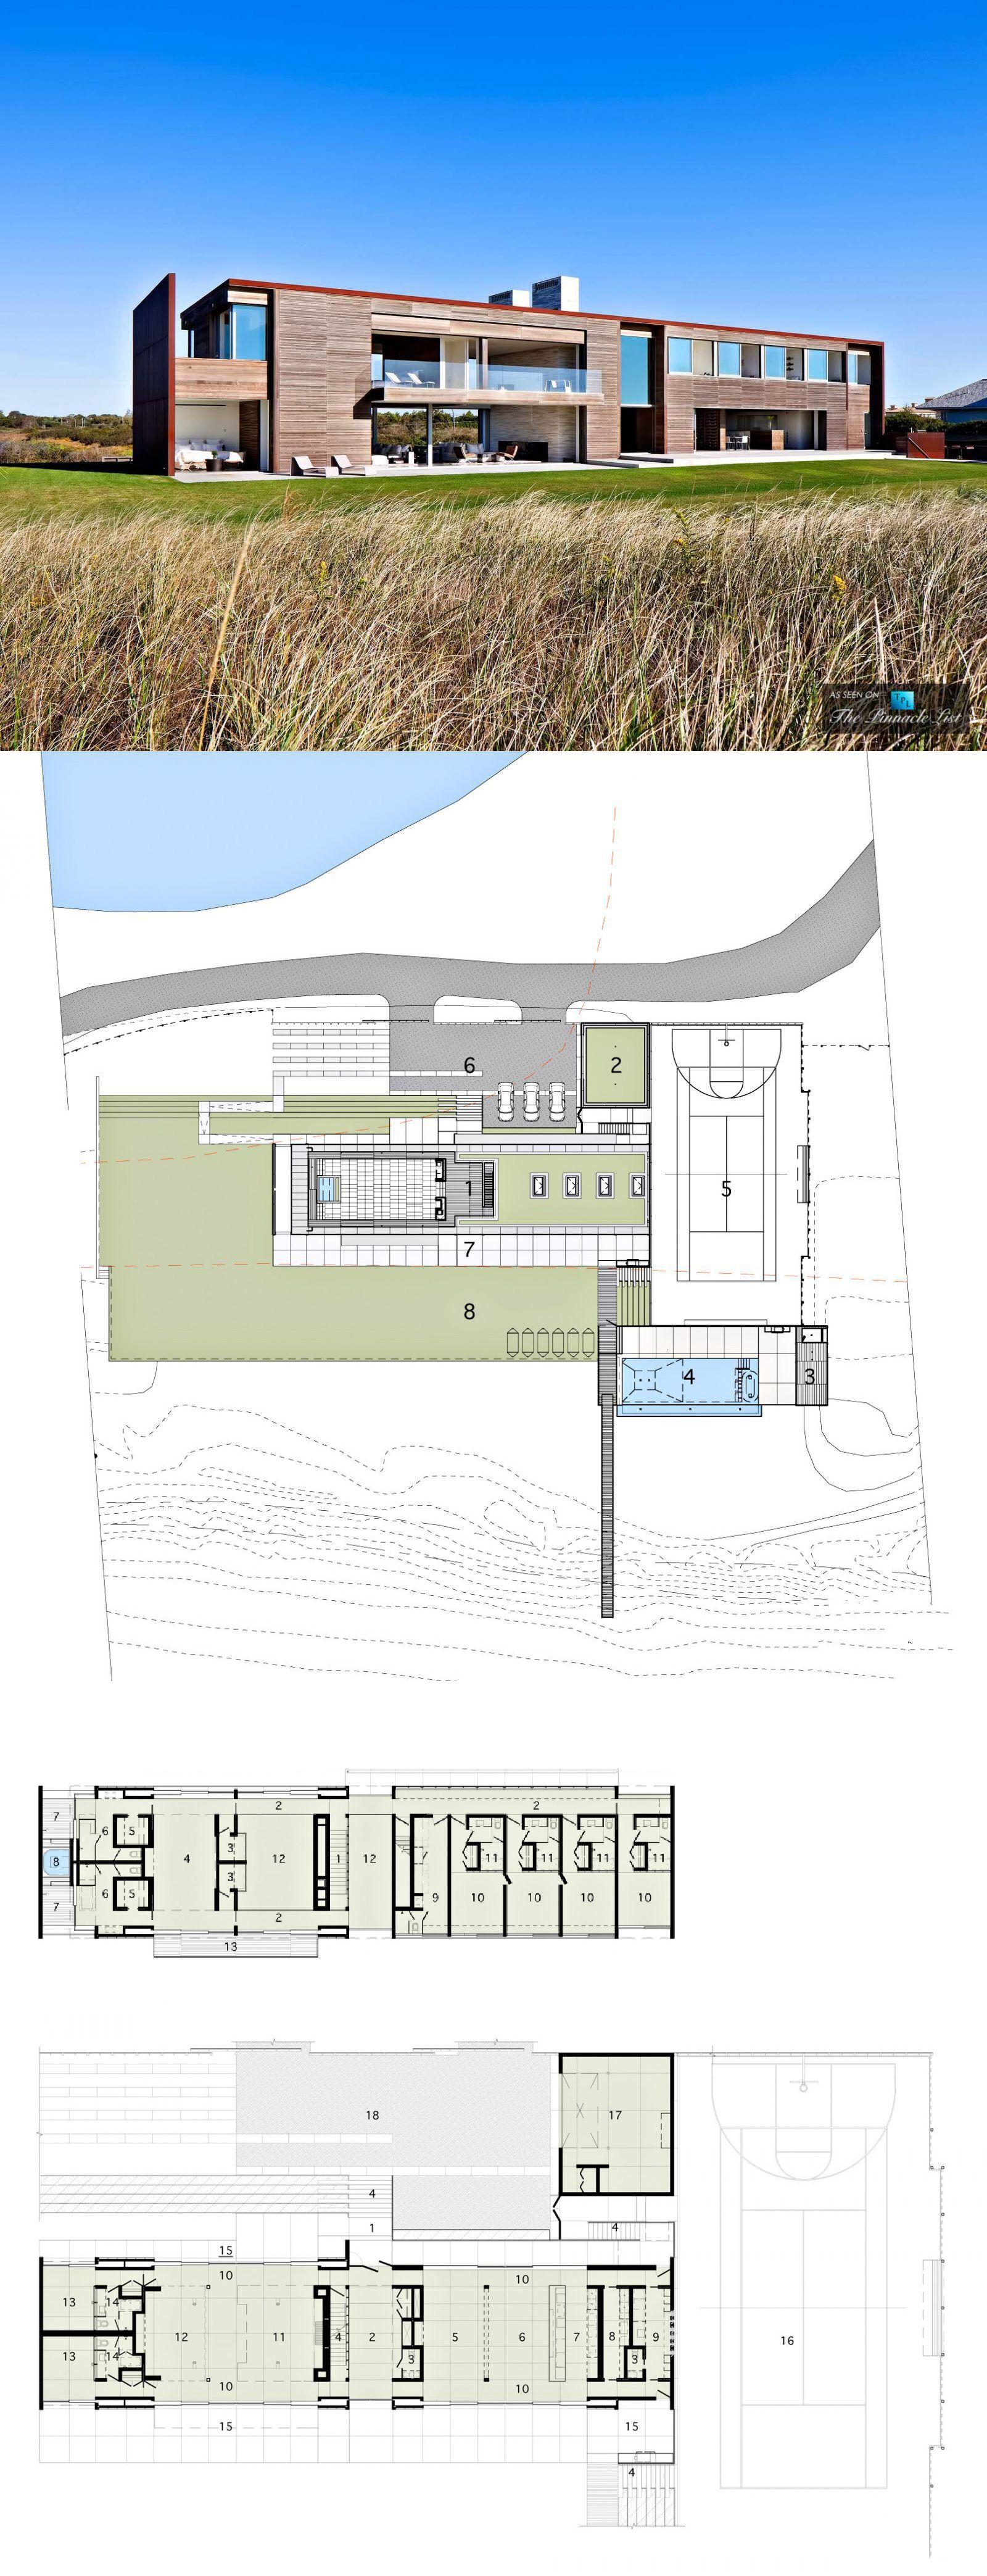 Hamptons Real Estate Showcase: 7 Fairfield Pond Ln, Sagaponack, NY, USA 🇺🇸